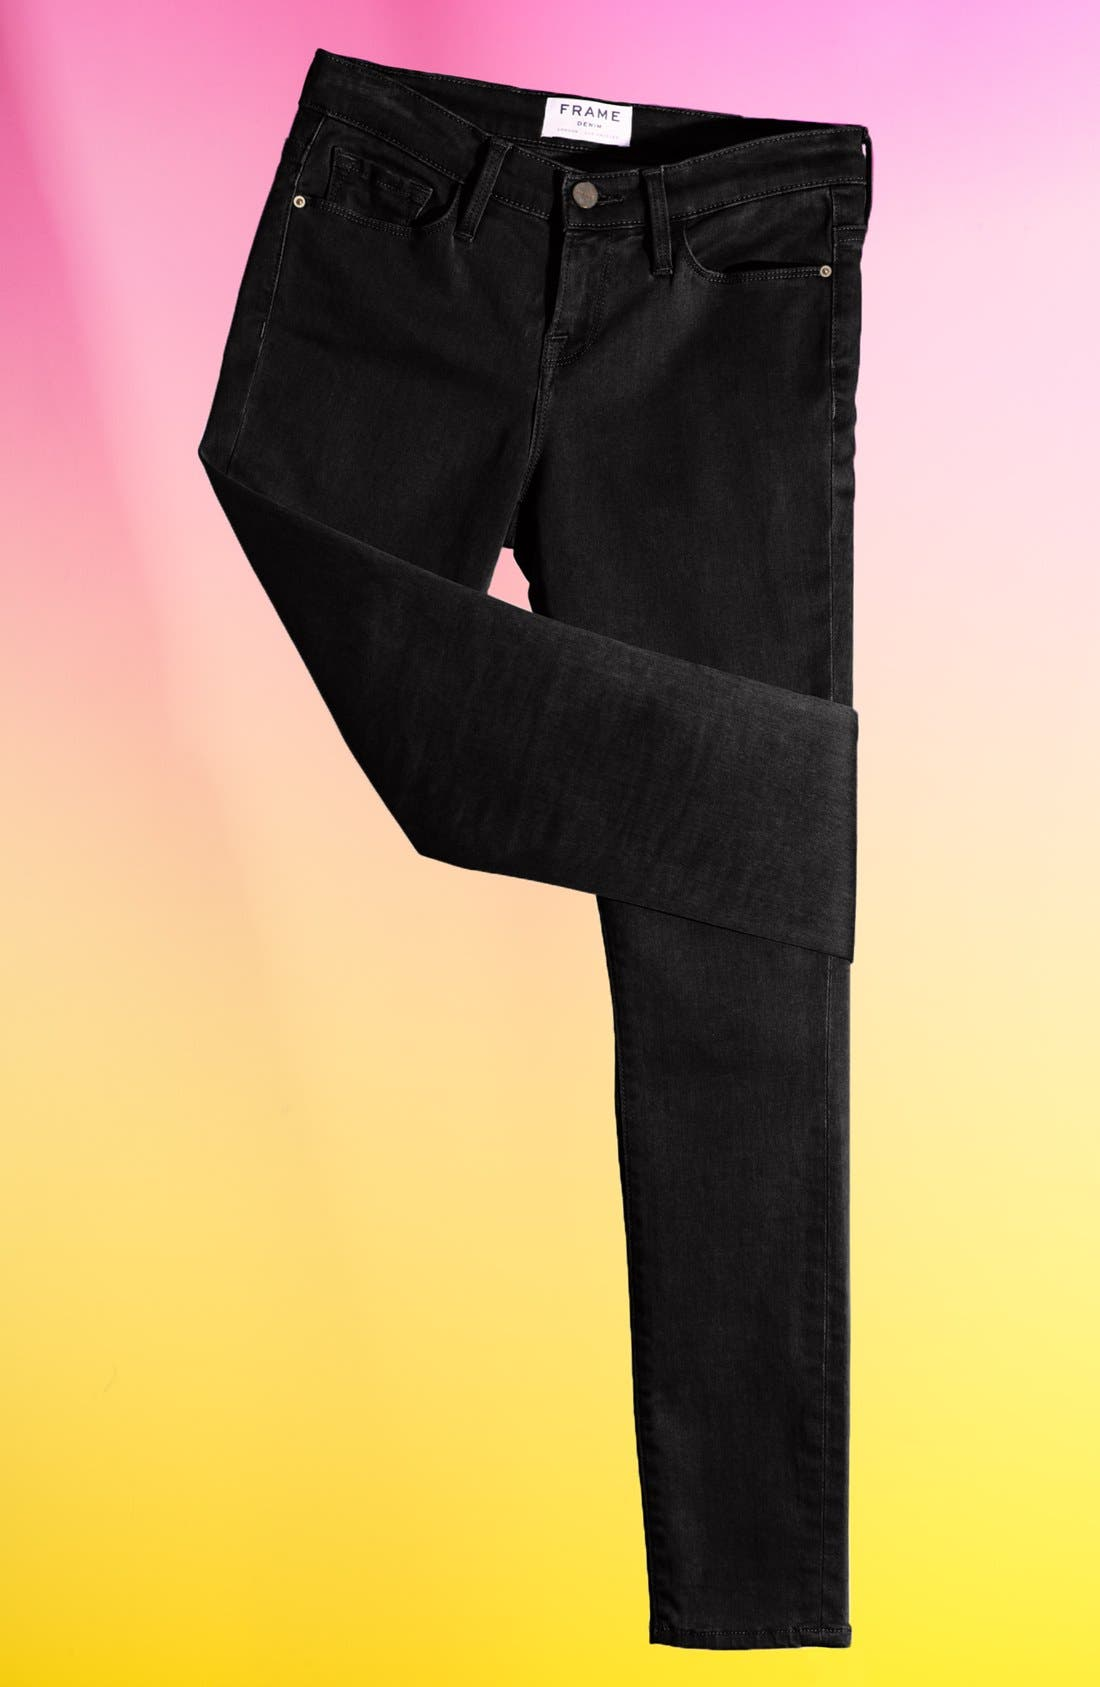 Main Image - Frame Denim 'Le Luxe Noir' Skinny Jeans (Vian)